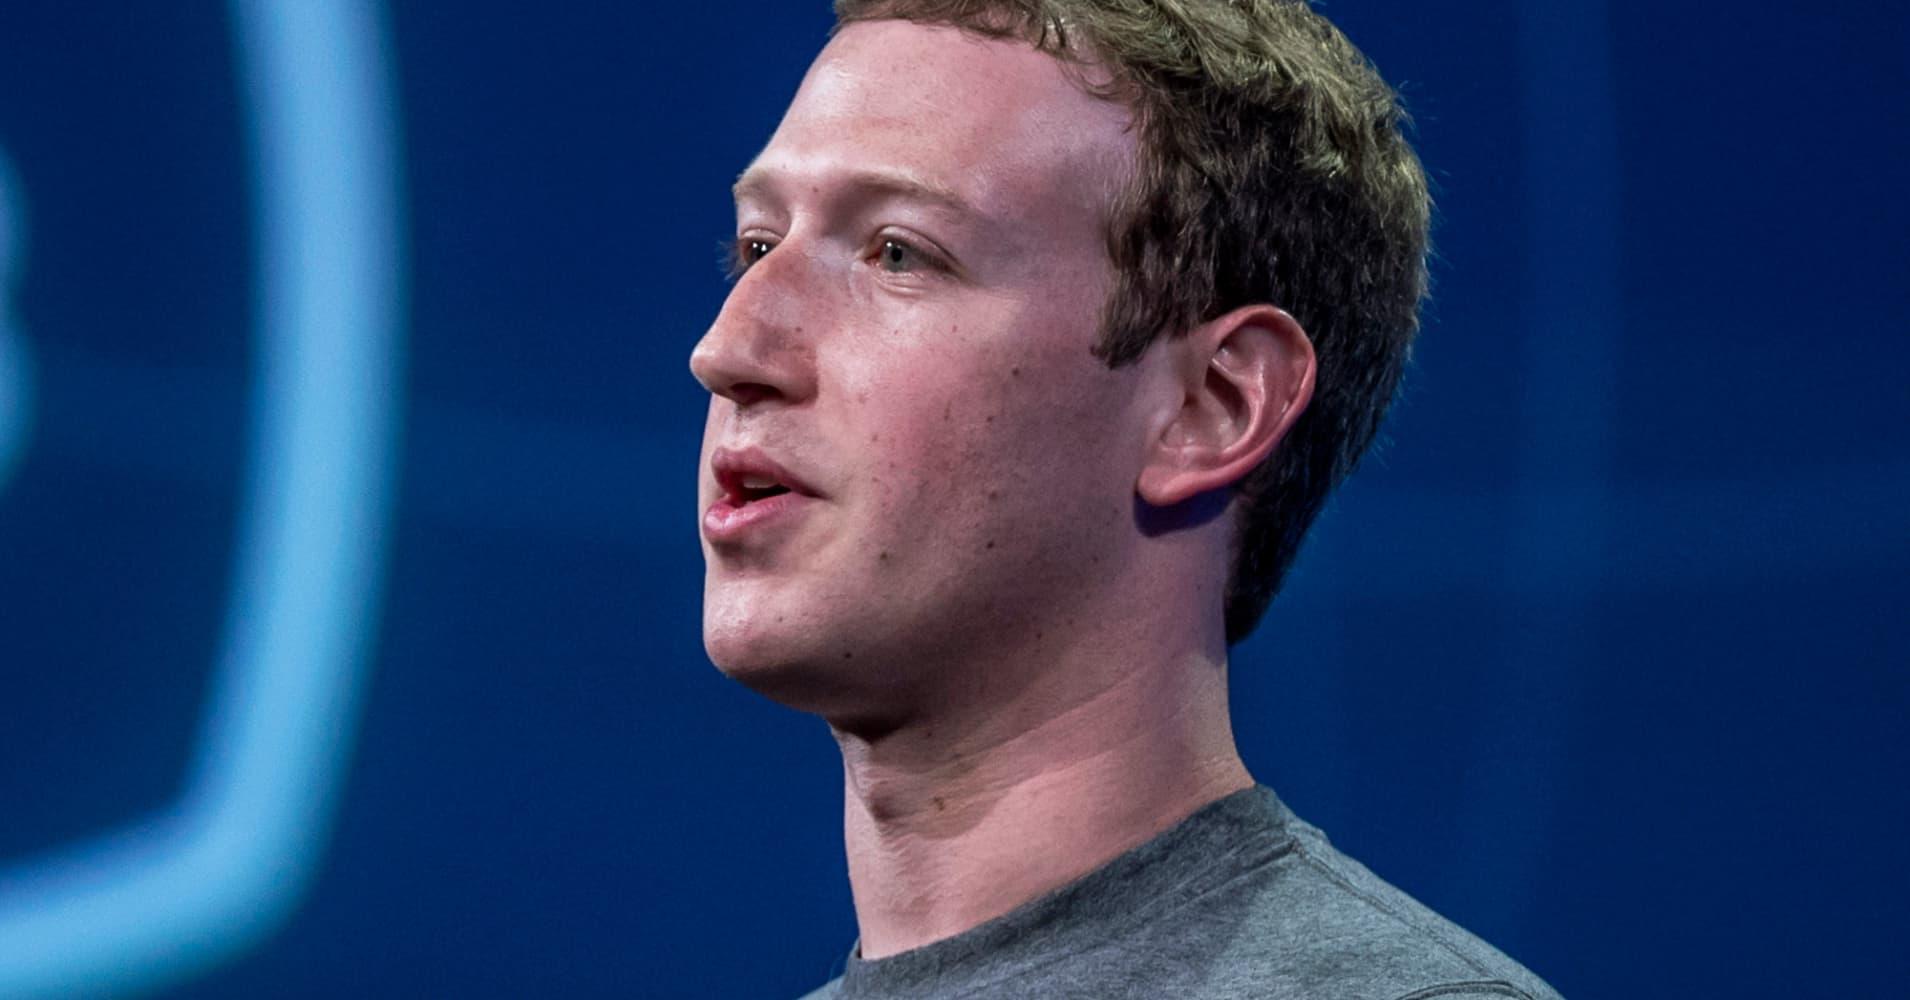 Facebook CEO Mark Zuckerberg 'reconsidering' Hawaii property lawsuits